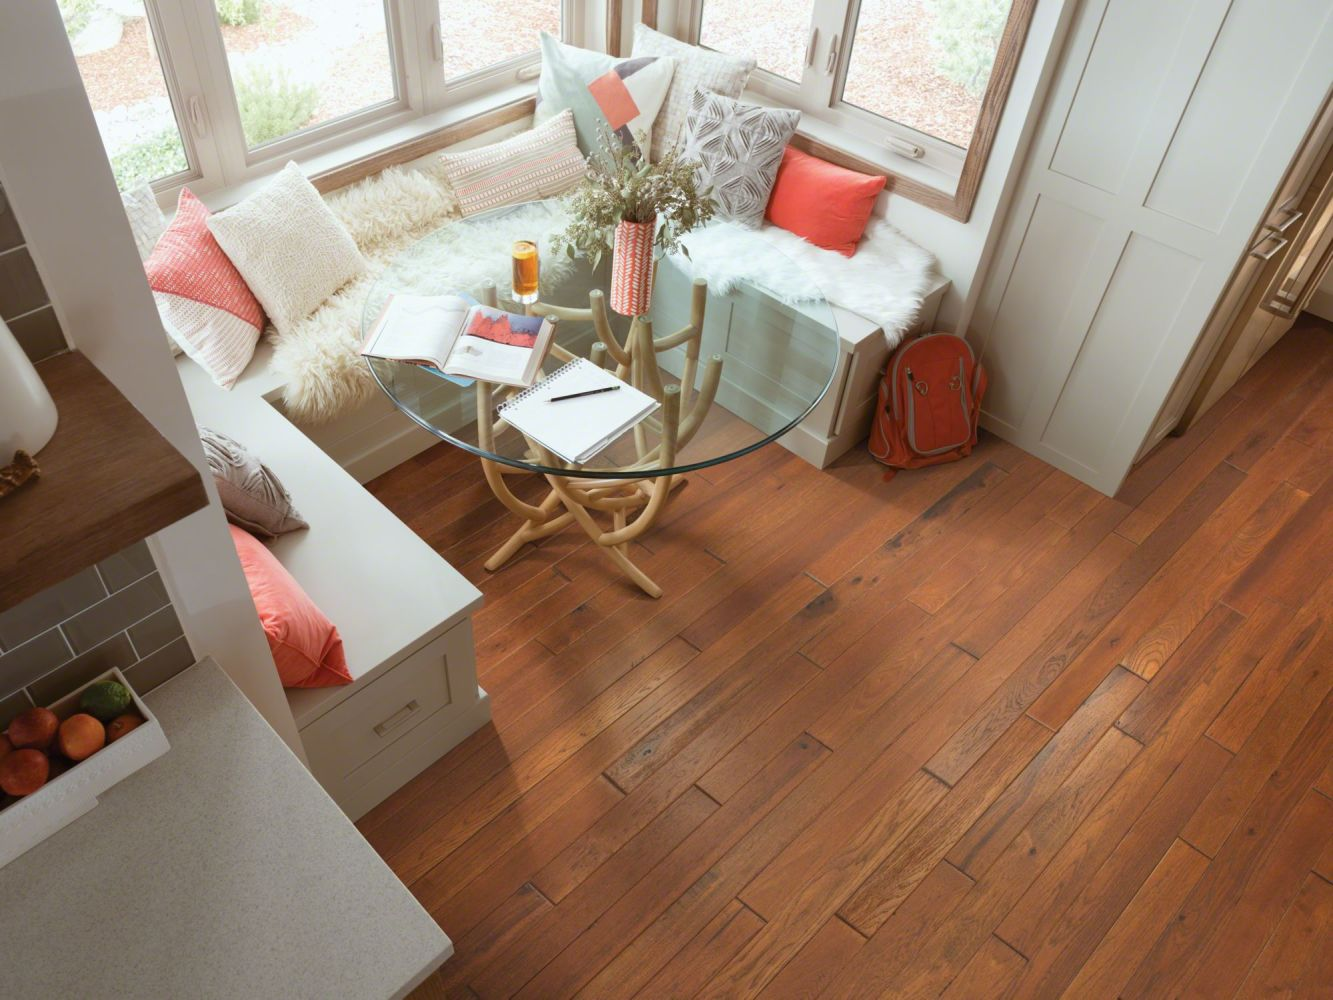 Shaw Floors Home Fn Gold Hardwood Freedom Caravan 00955_HW563